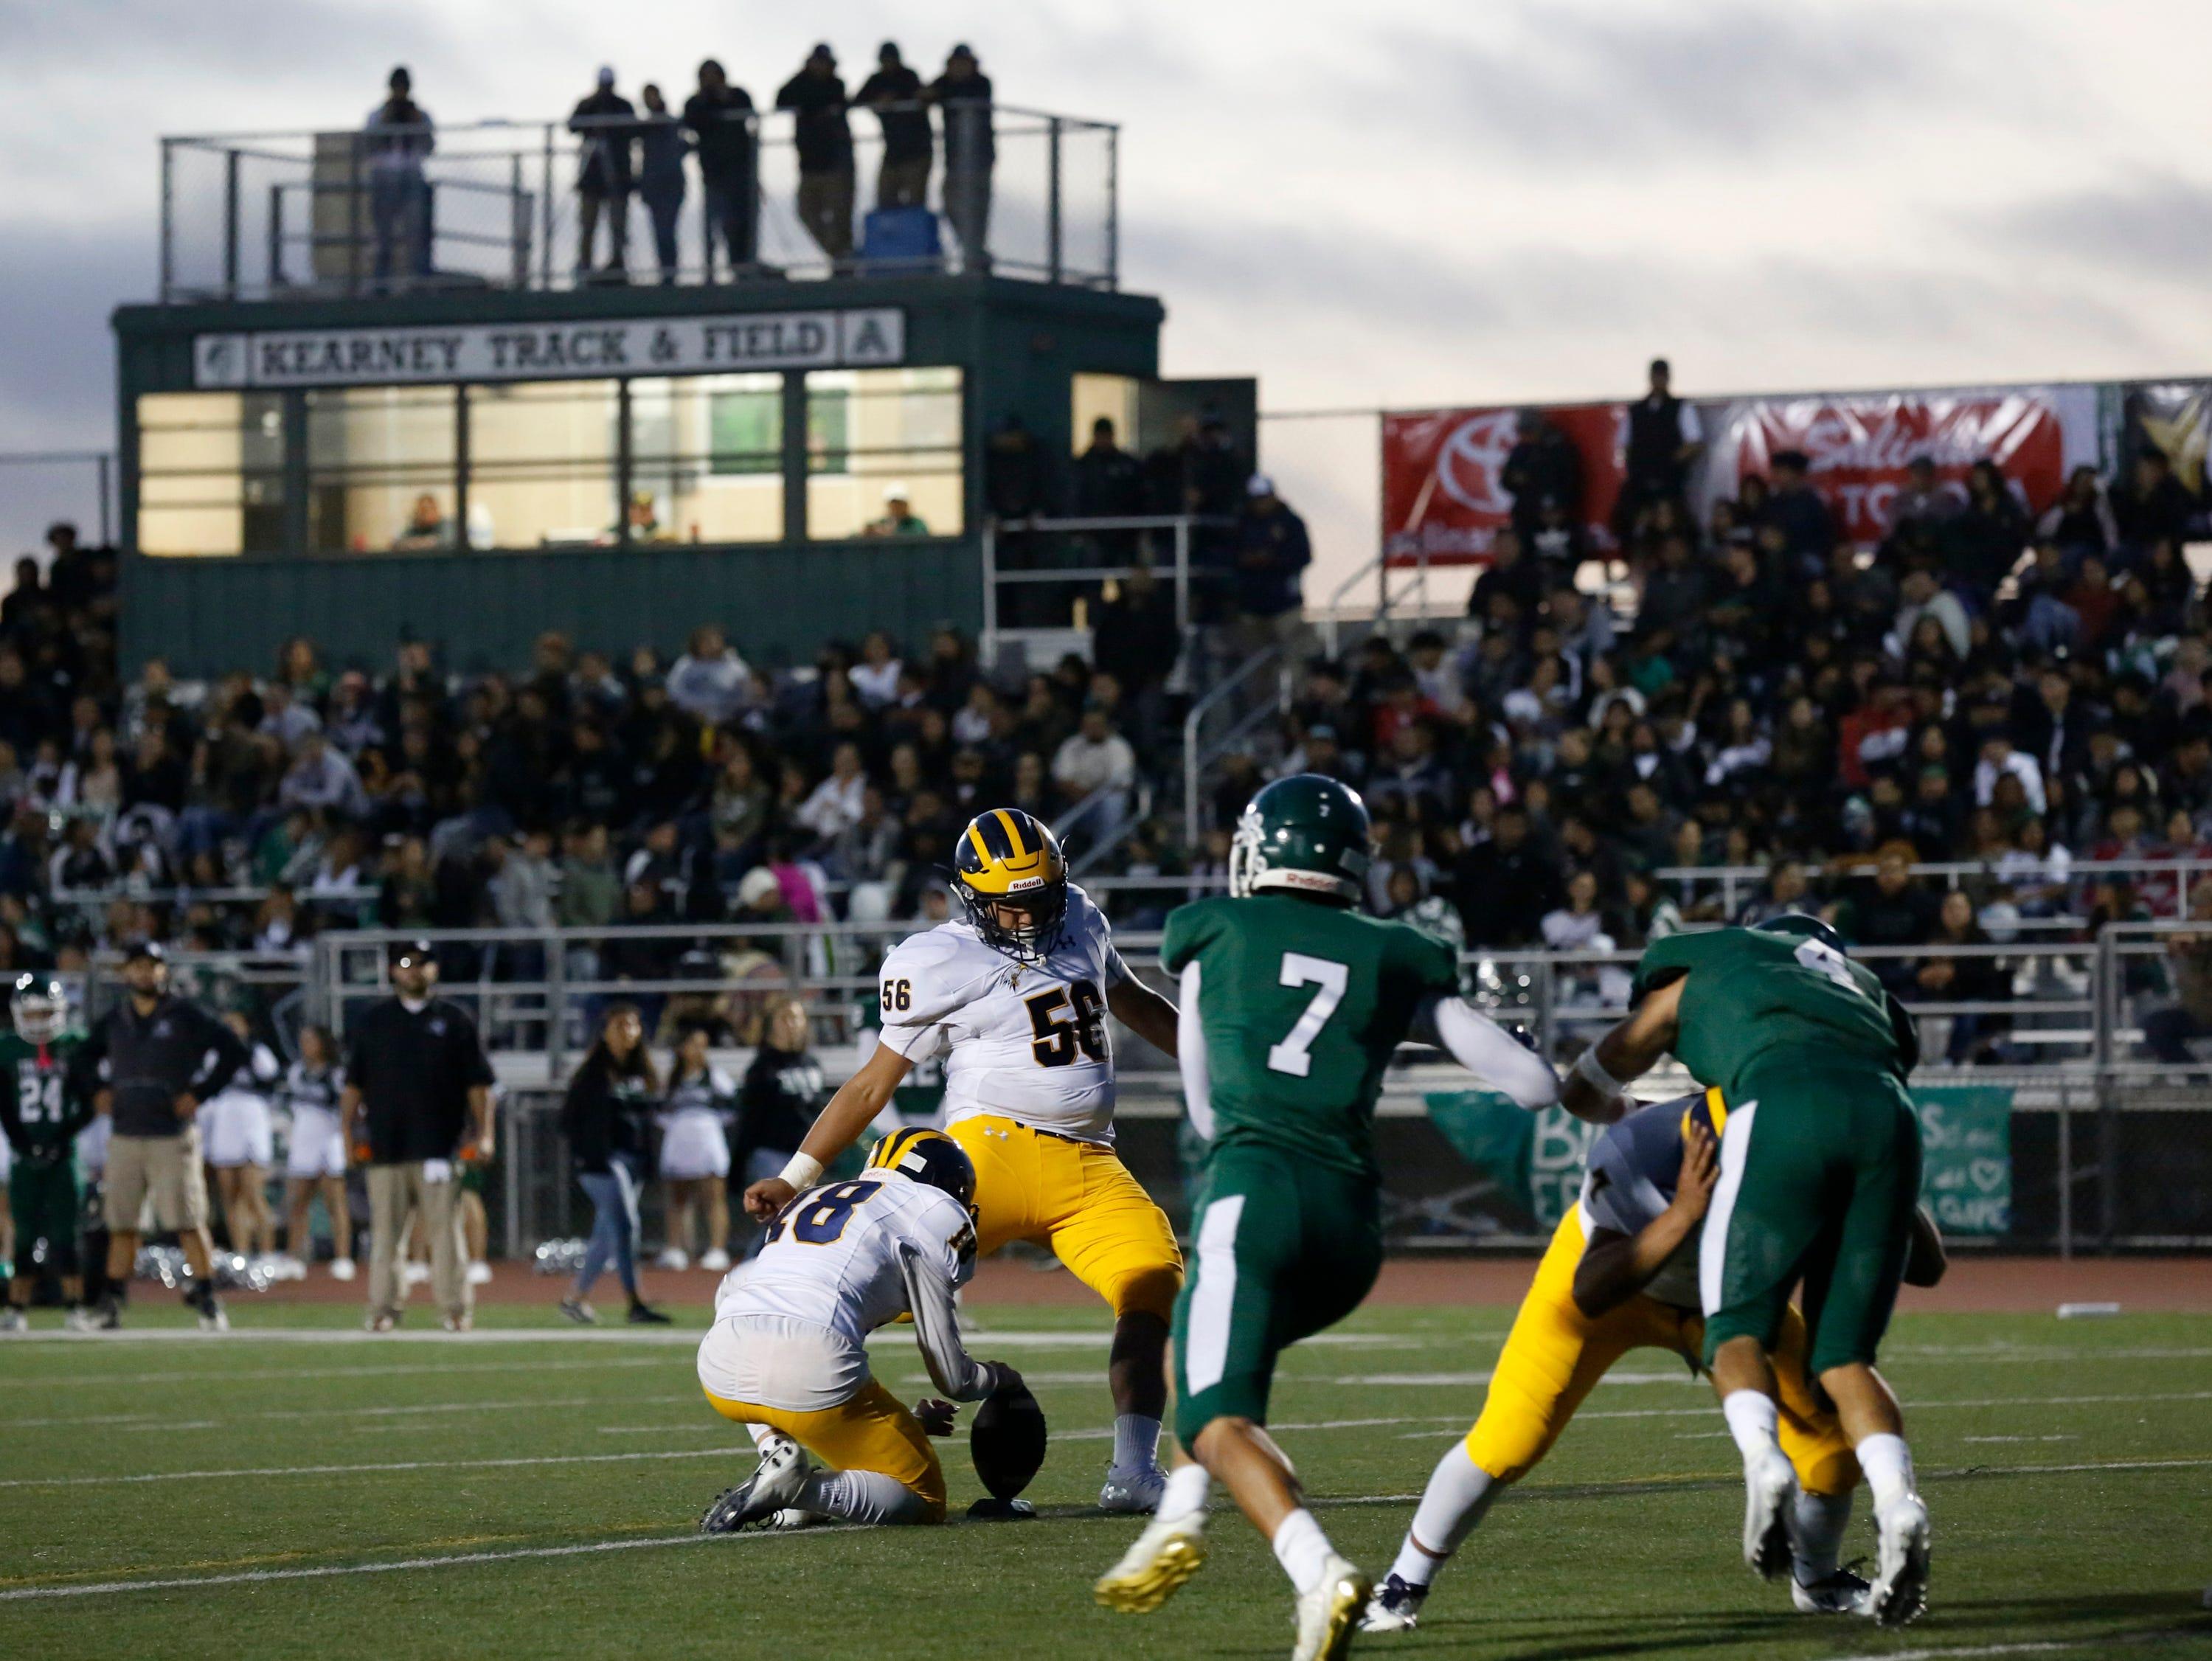 Everett Alvarez's Salvador Pandoja kicks an extra point during football at Alisal High School in Salinas on Friday August 31, 2018. (Photo By David Royal)